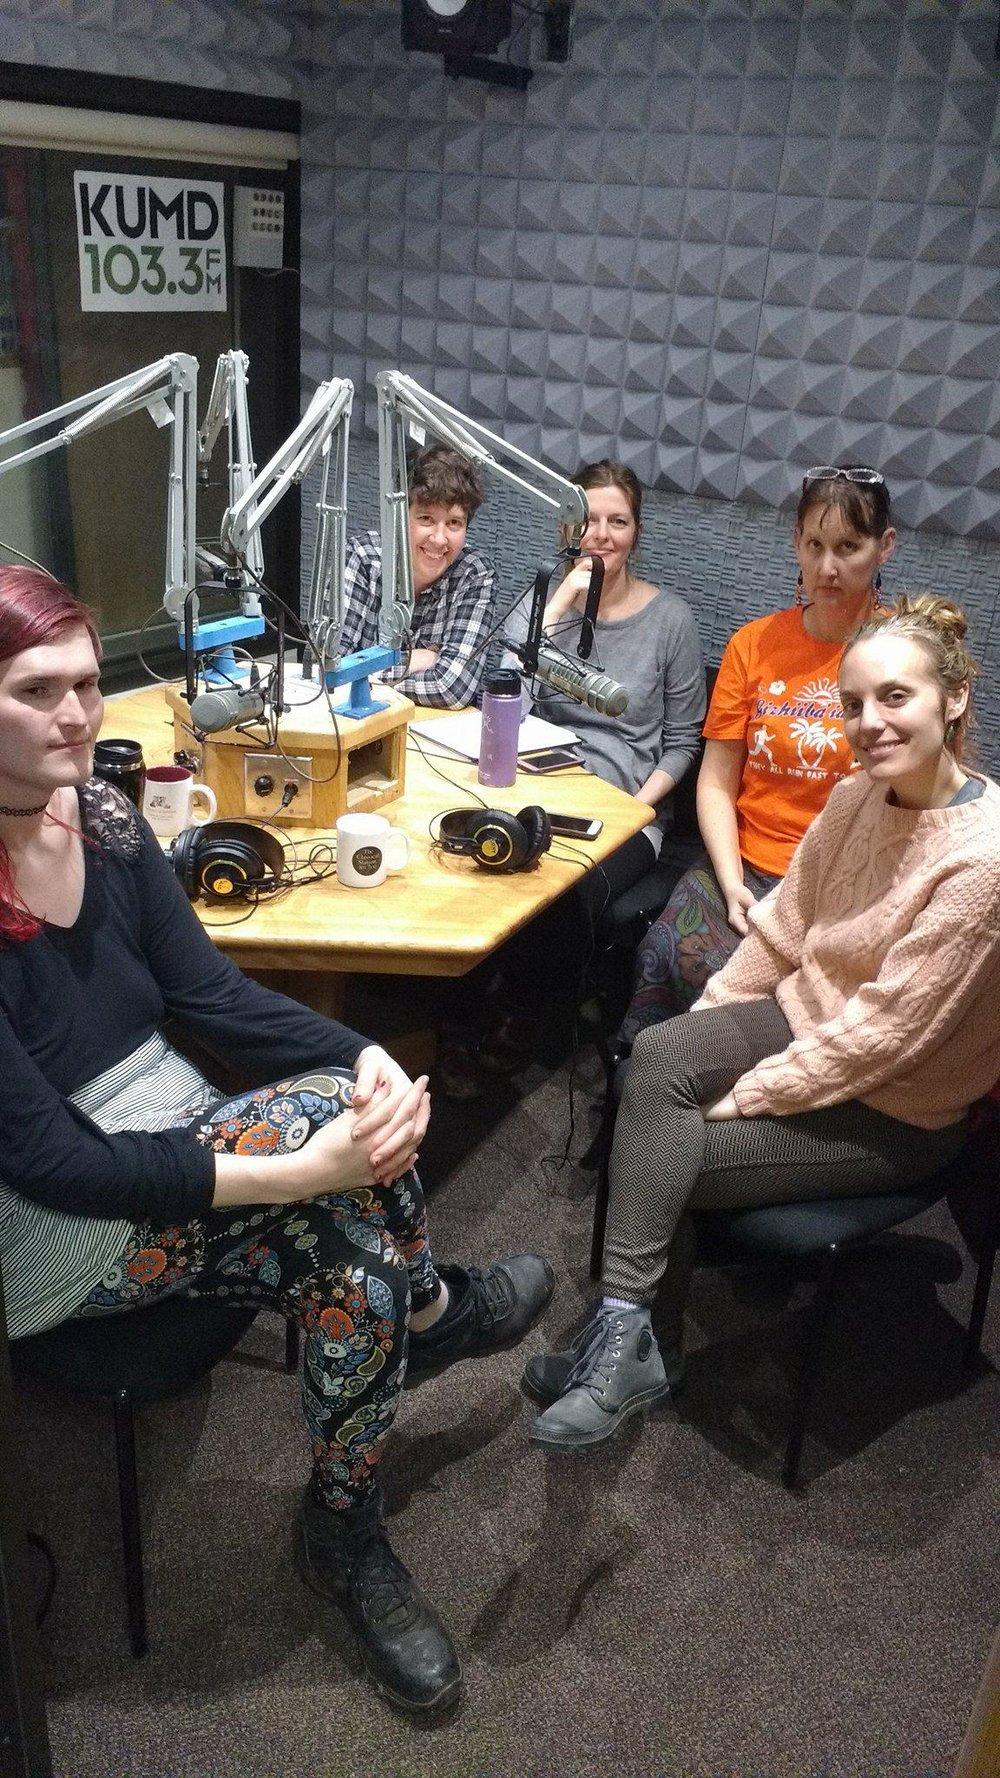 From left: Moriah Skye, Andrea Crouse, Anna Tennis, Lyz Jaakola, Shaunna Heckman